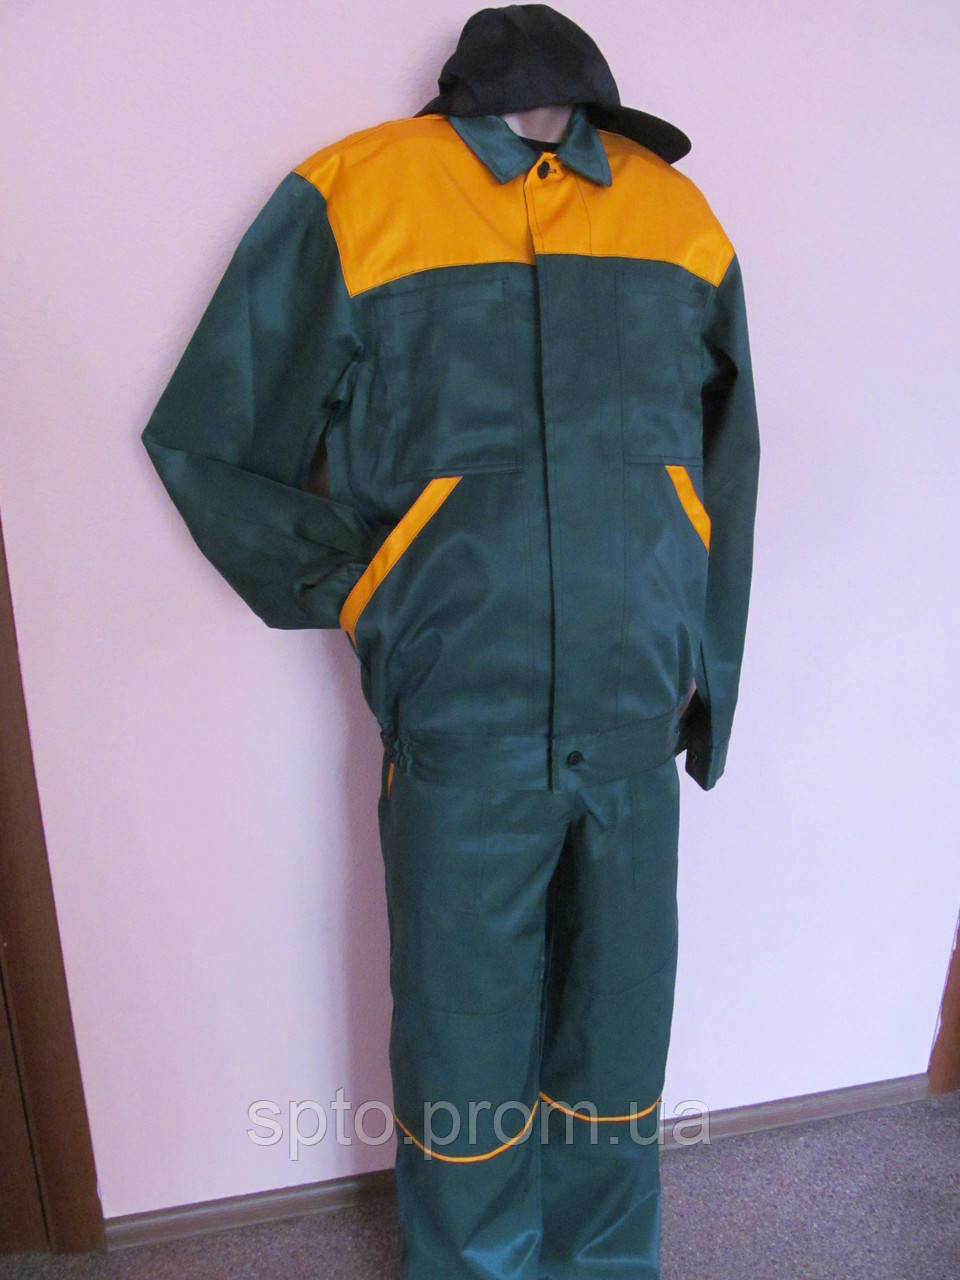 Костюм рабочий. Полукомбинезон + куртка, размер 48